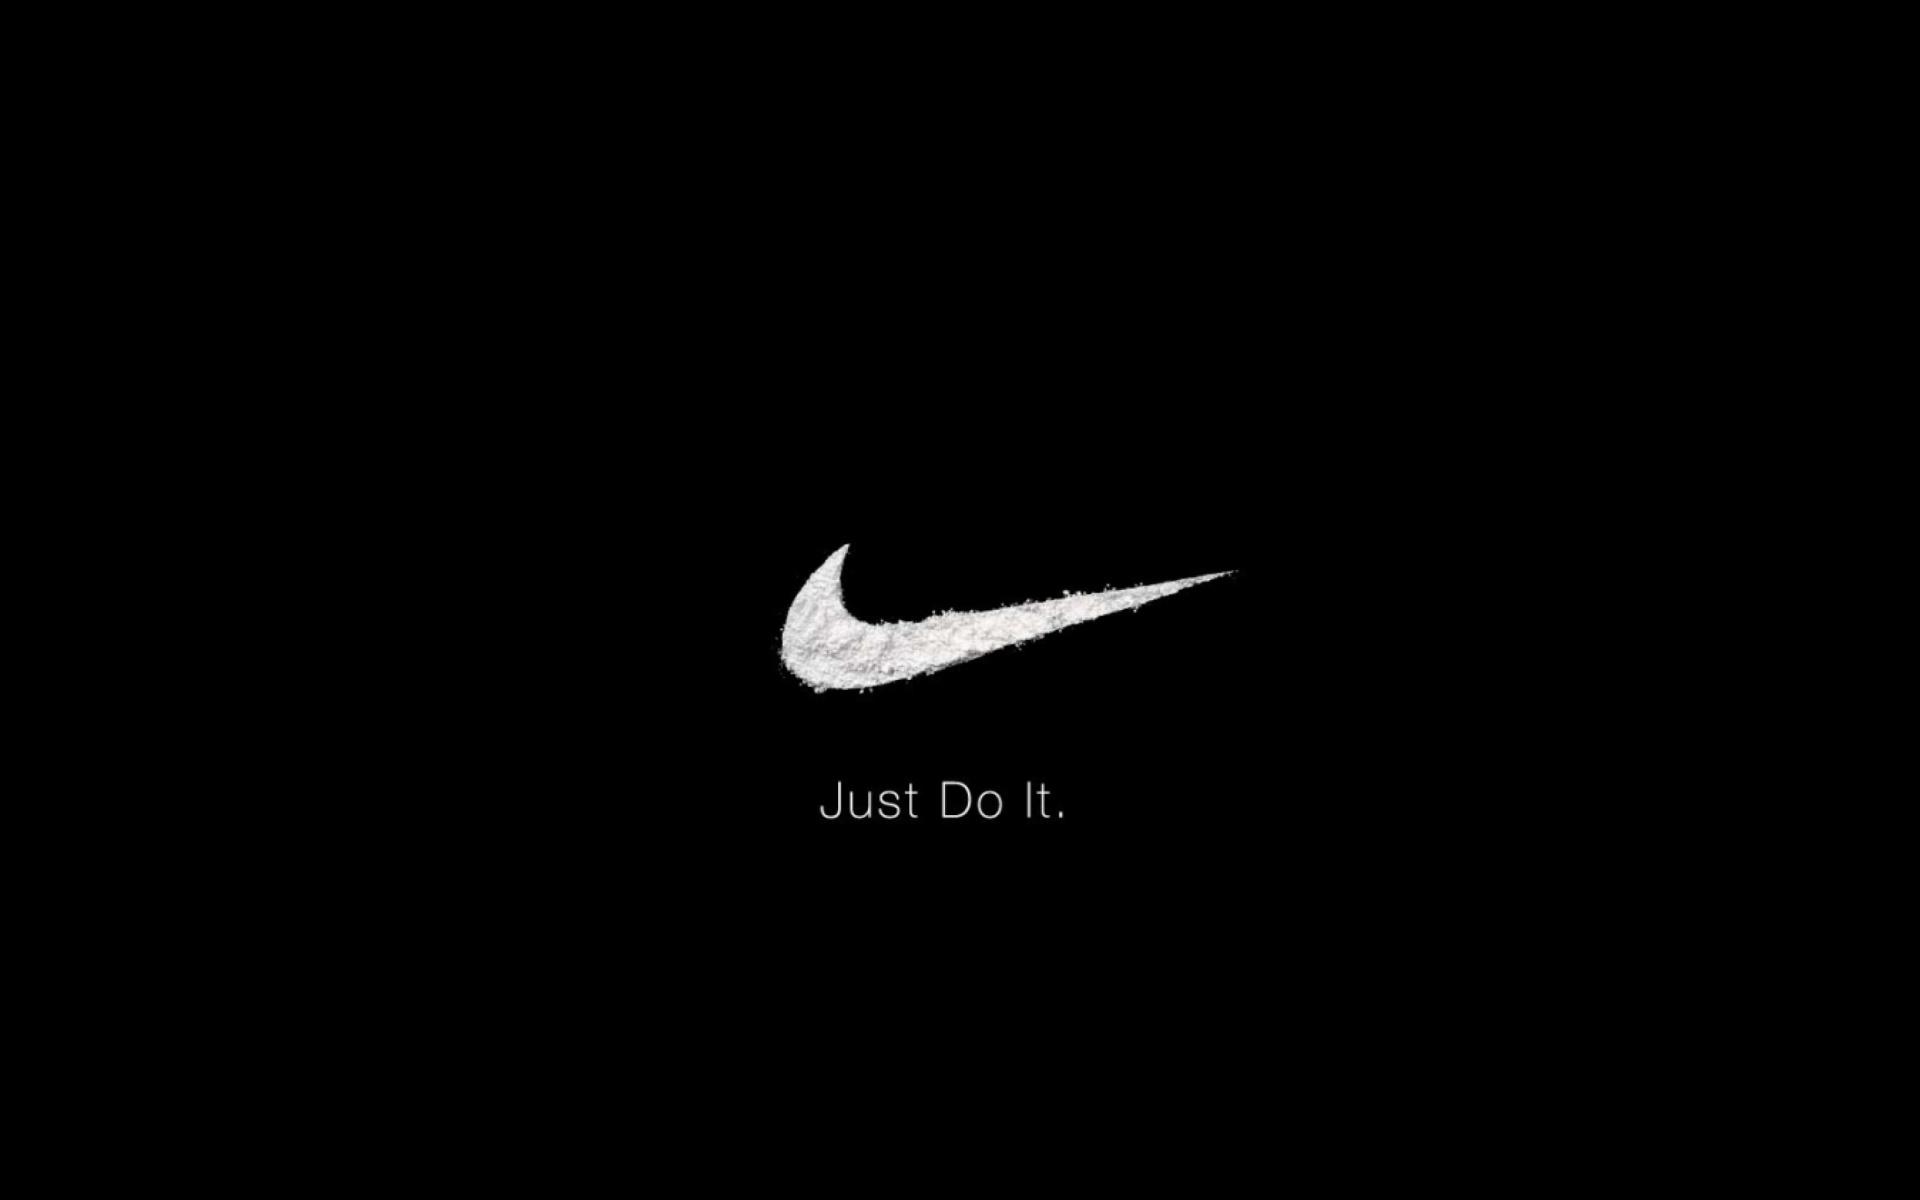 Shameless Quotes Phone Wallpaper Nike Logo Hd Wallpaper For 1920x1200